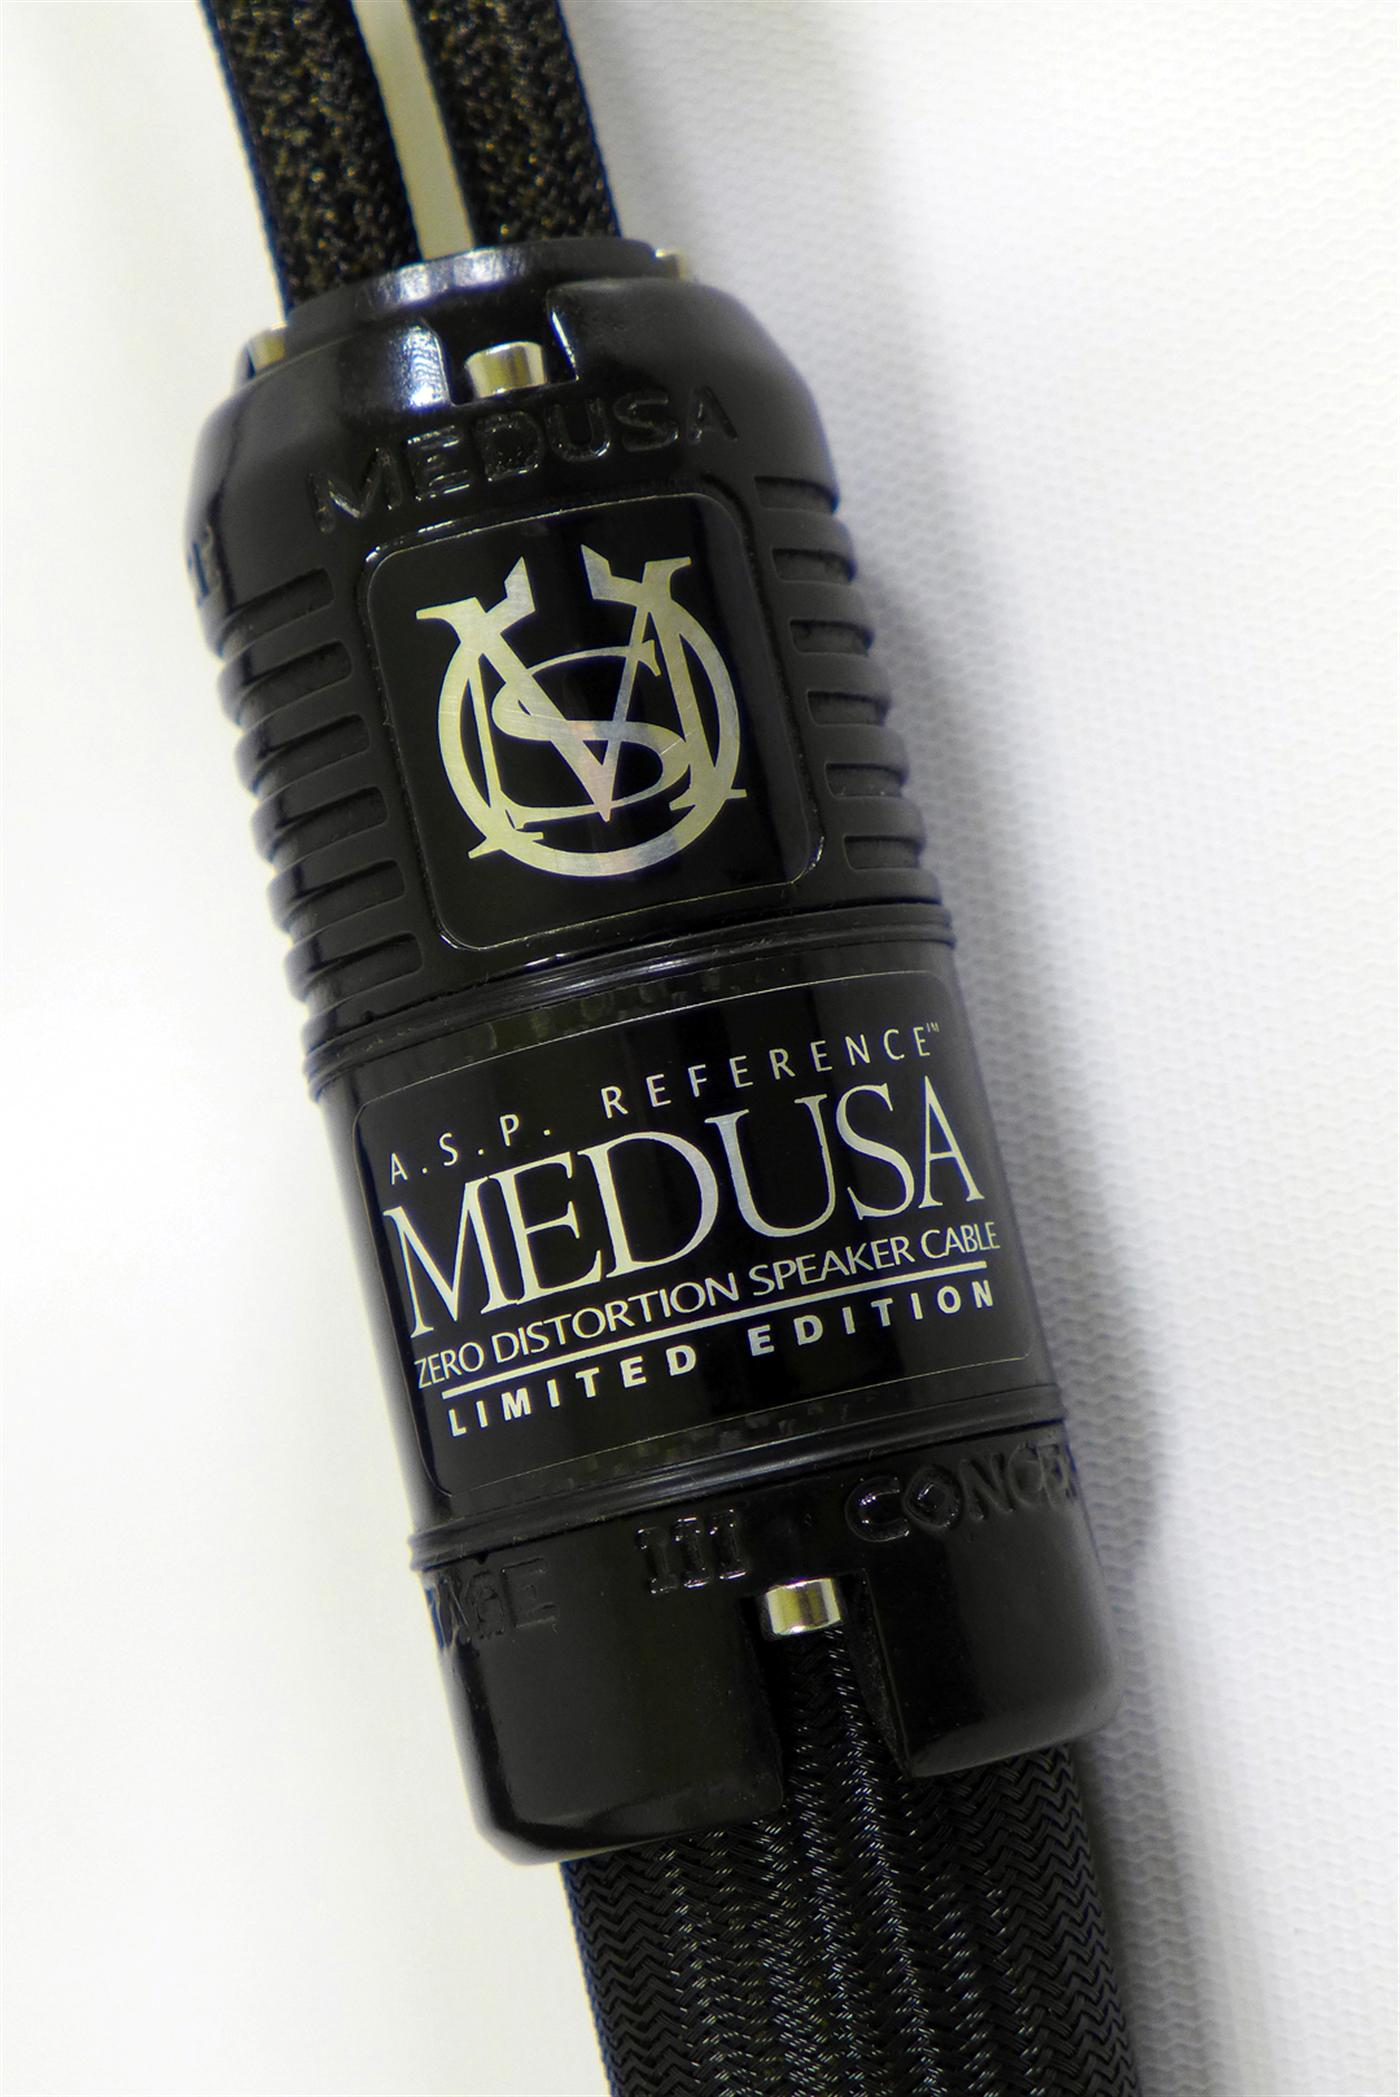 singularity-audio-uk-stage-iii-concepts-medusa-speaker-cable-uk-dealer